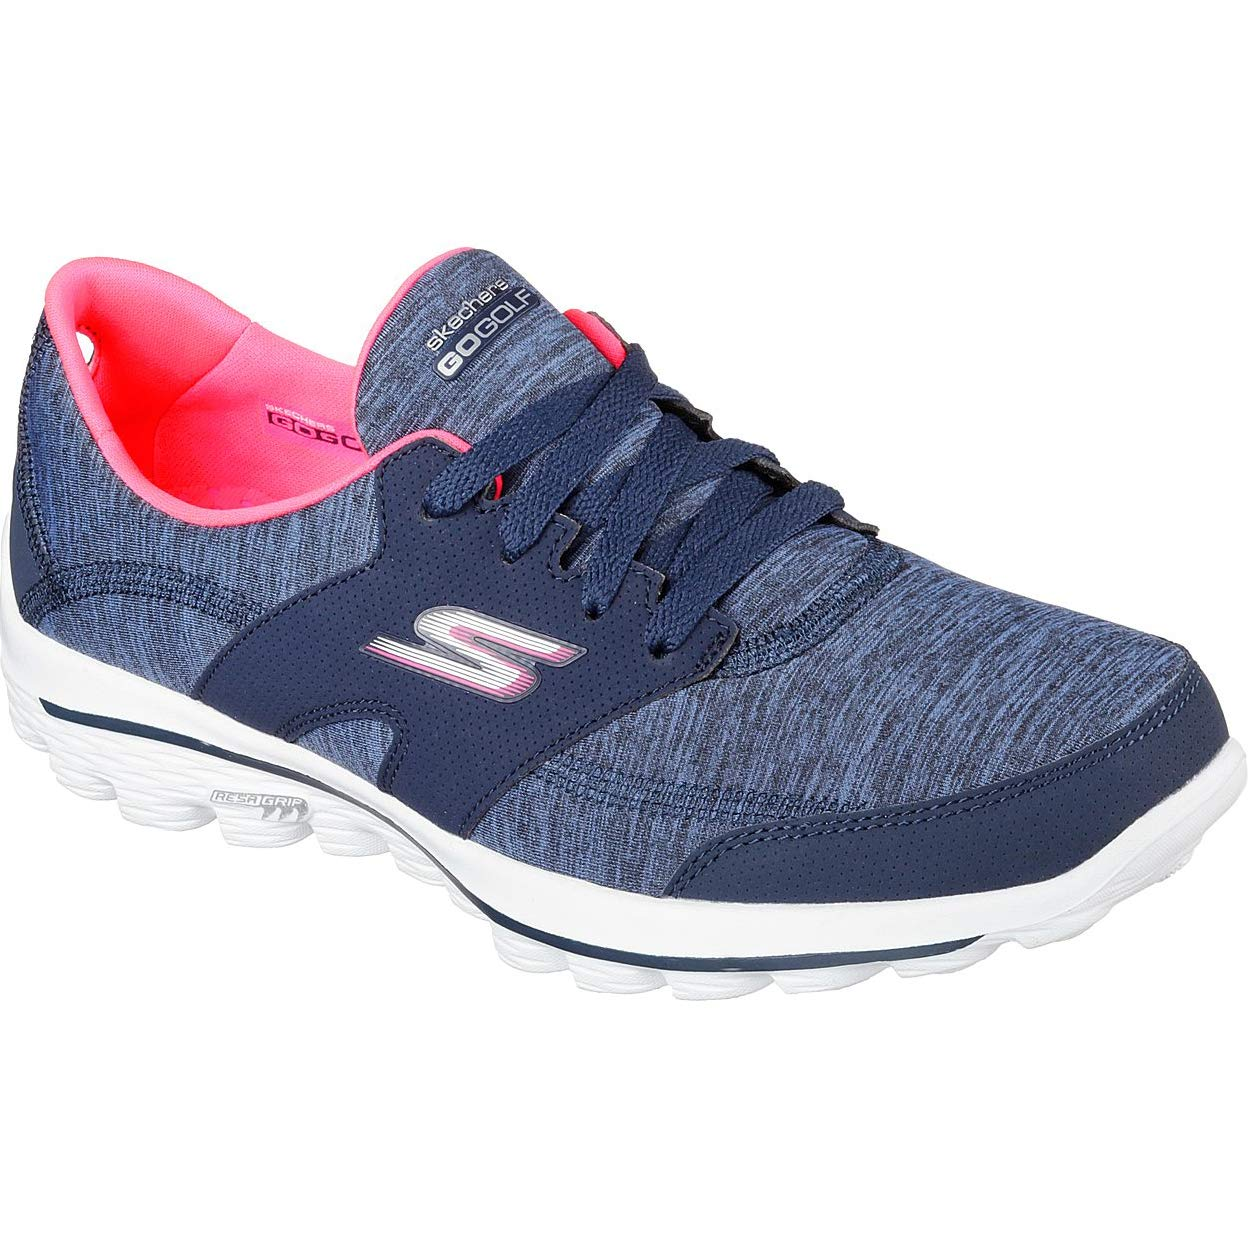 Skechers Performance Women's Go Walk 2 Backswing Golf Shoe,Navy/Pink,9 M US